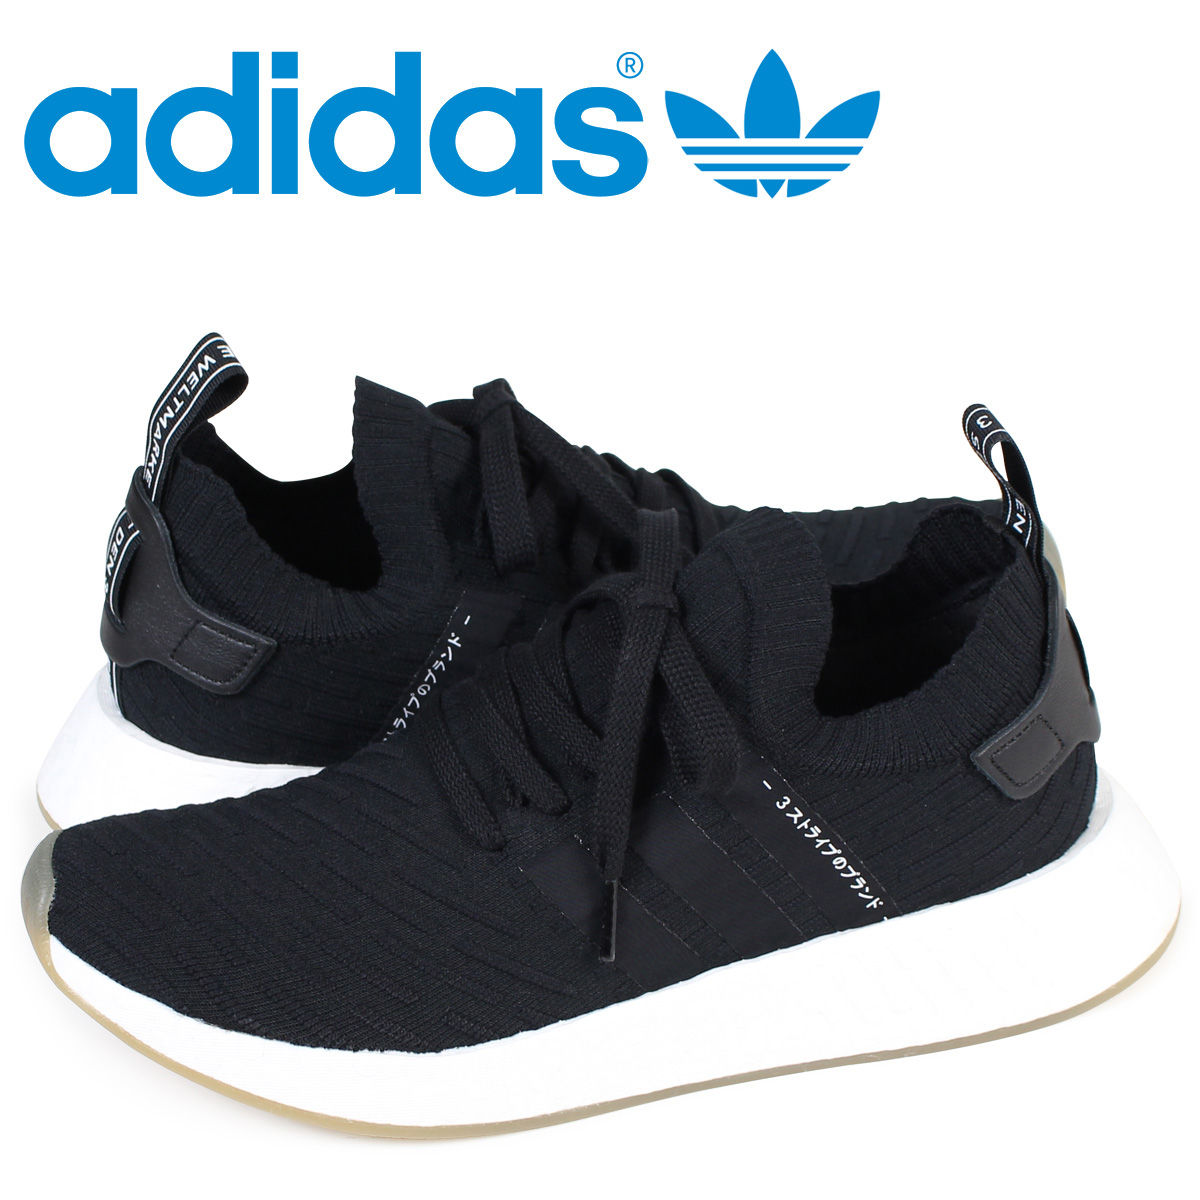 519ded802b88b Adidas NMD R1 PK adidas originals sneakers nomad men BY9696 shoes black  10 28  Shinnyu load